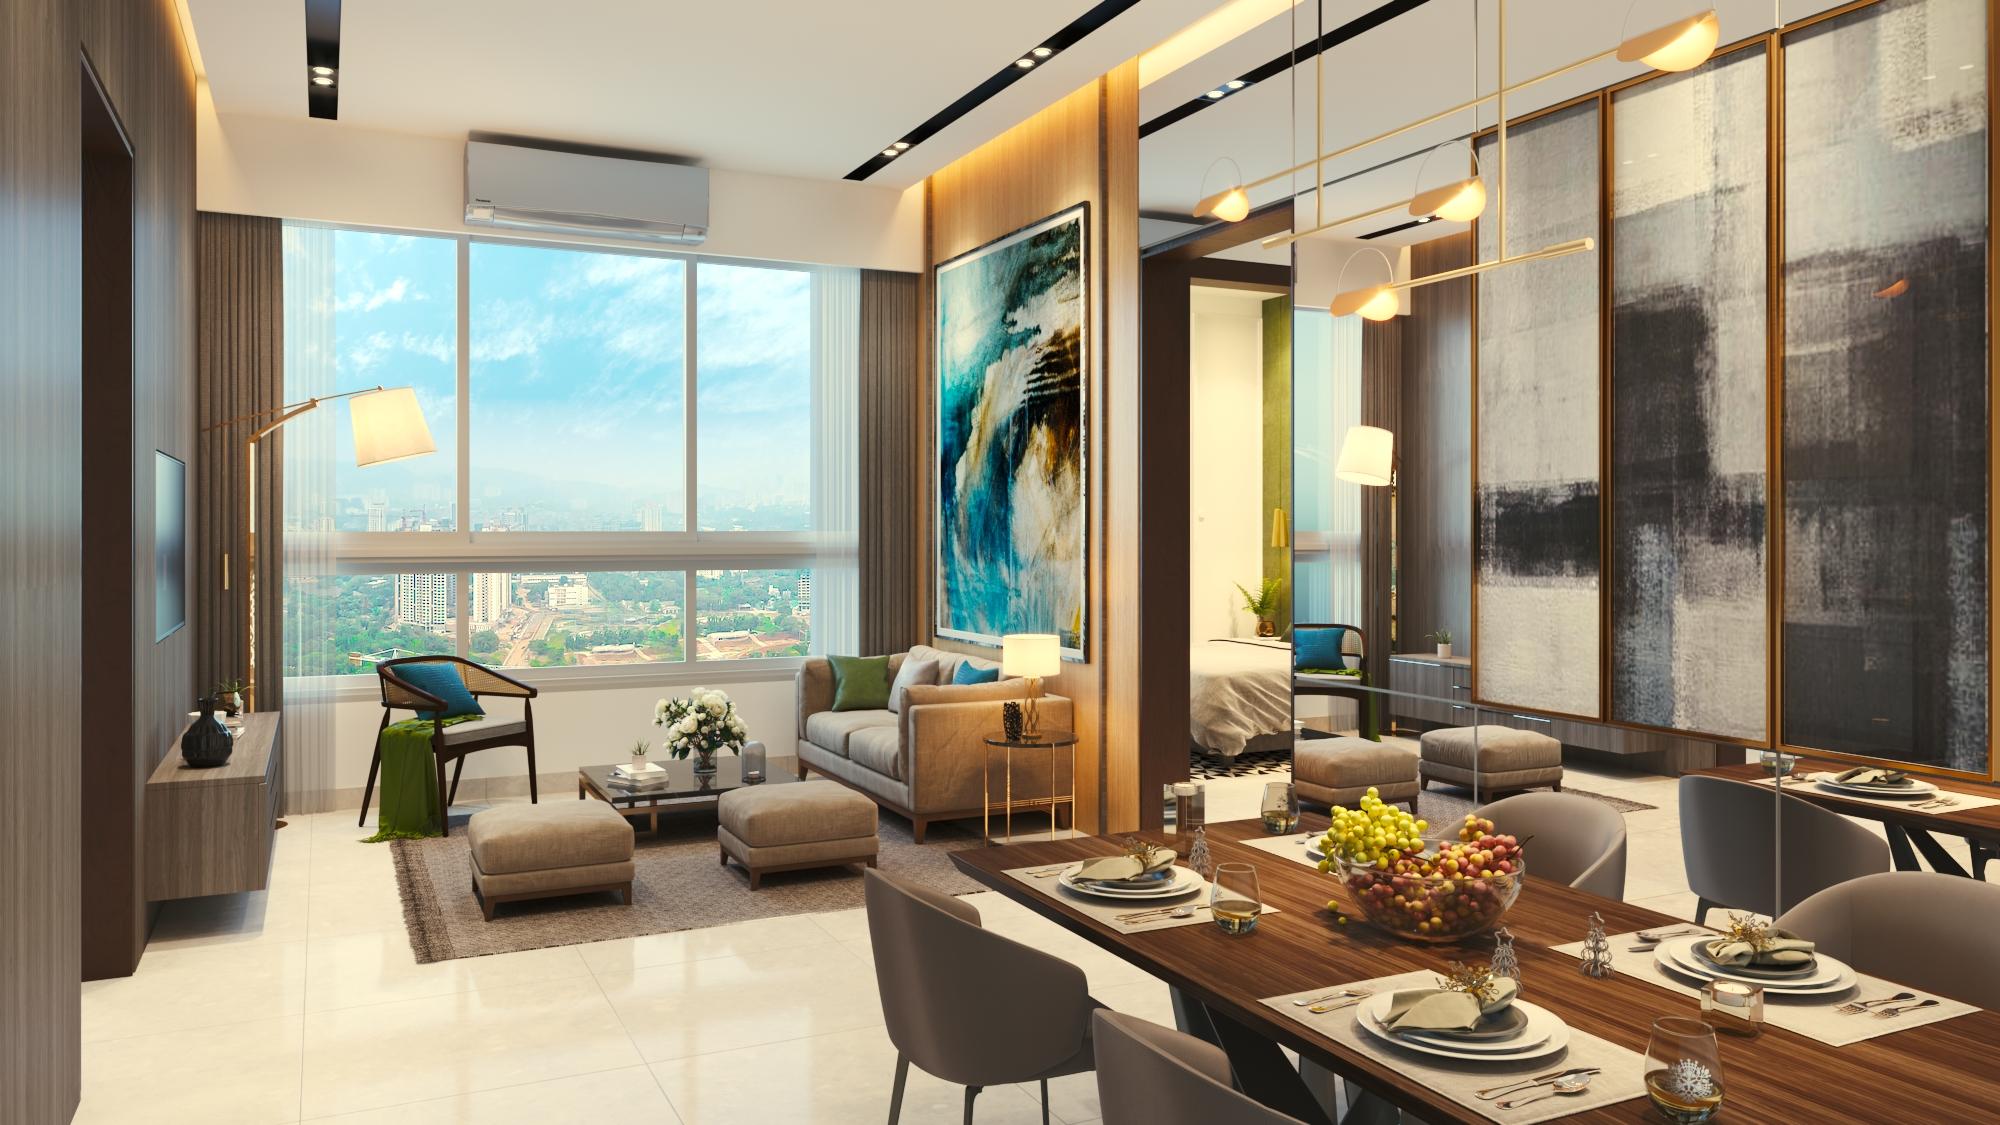 piramal vaikunth a class homes series 2 apartment interiors21